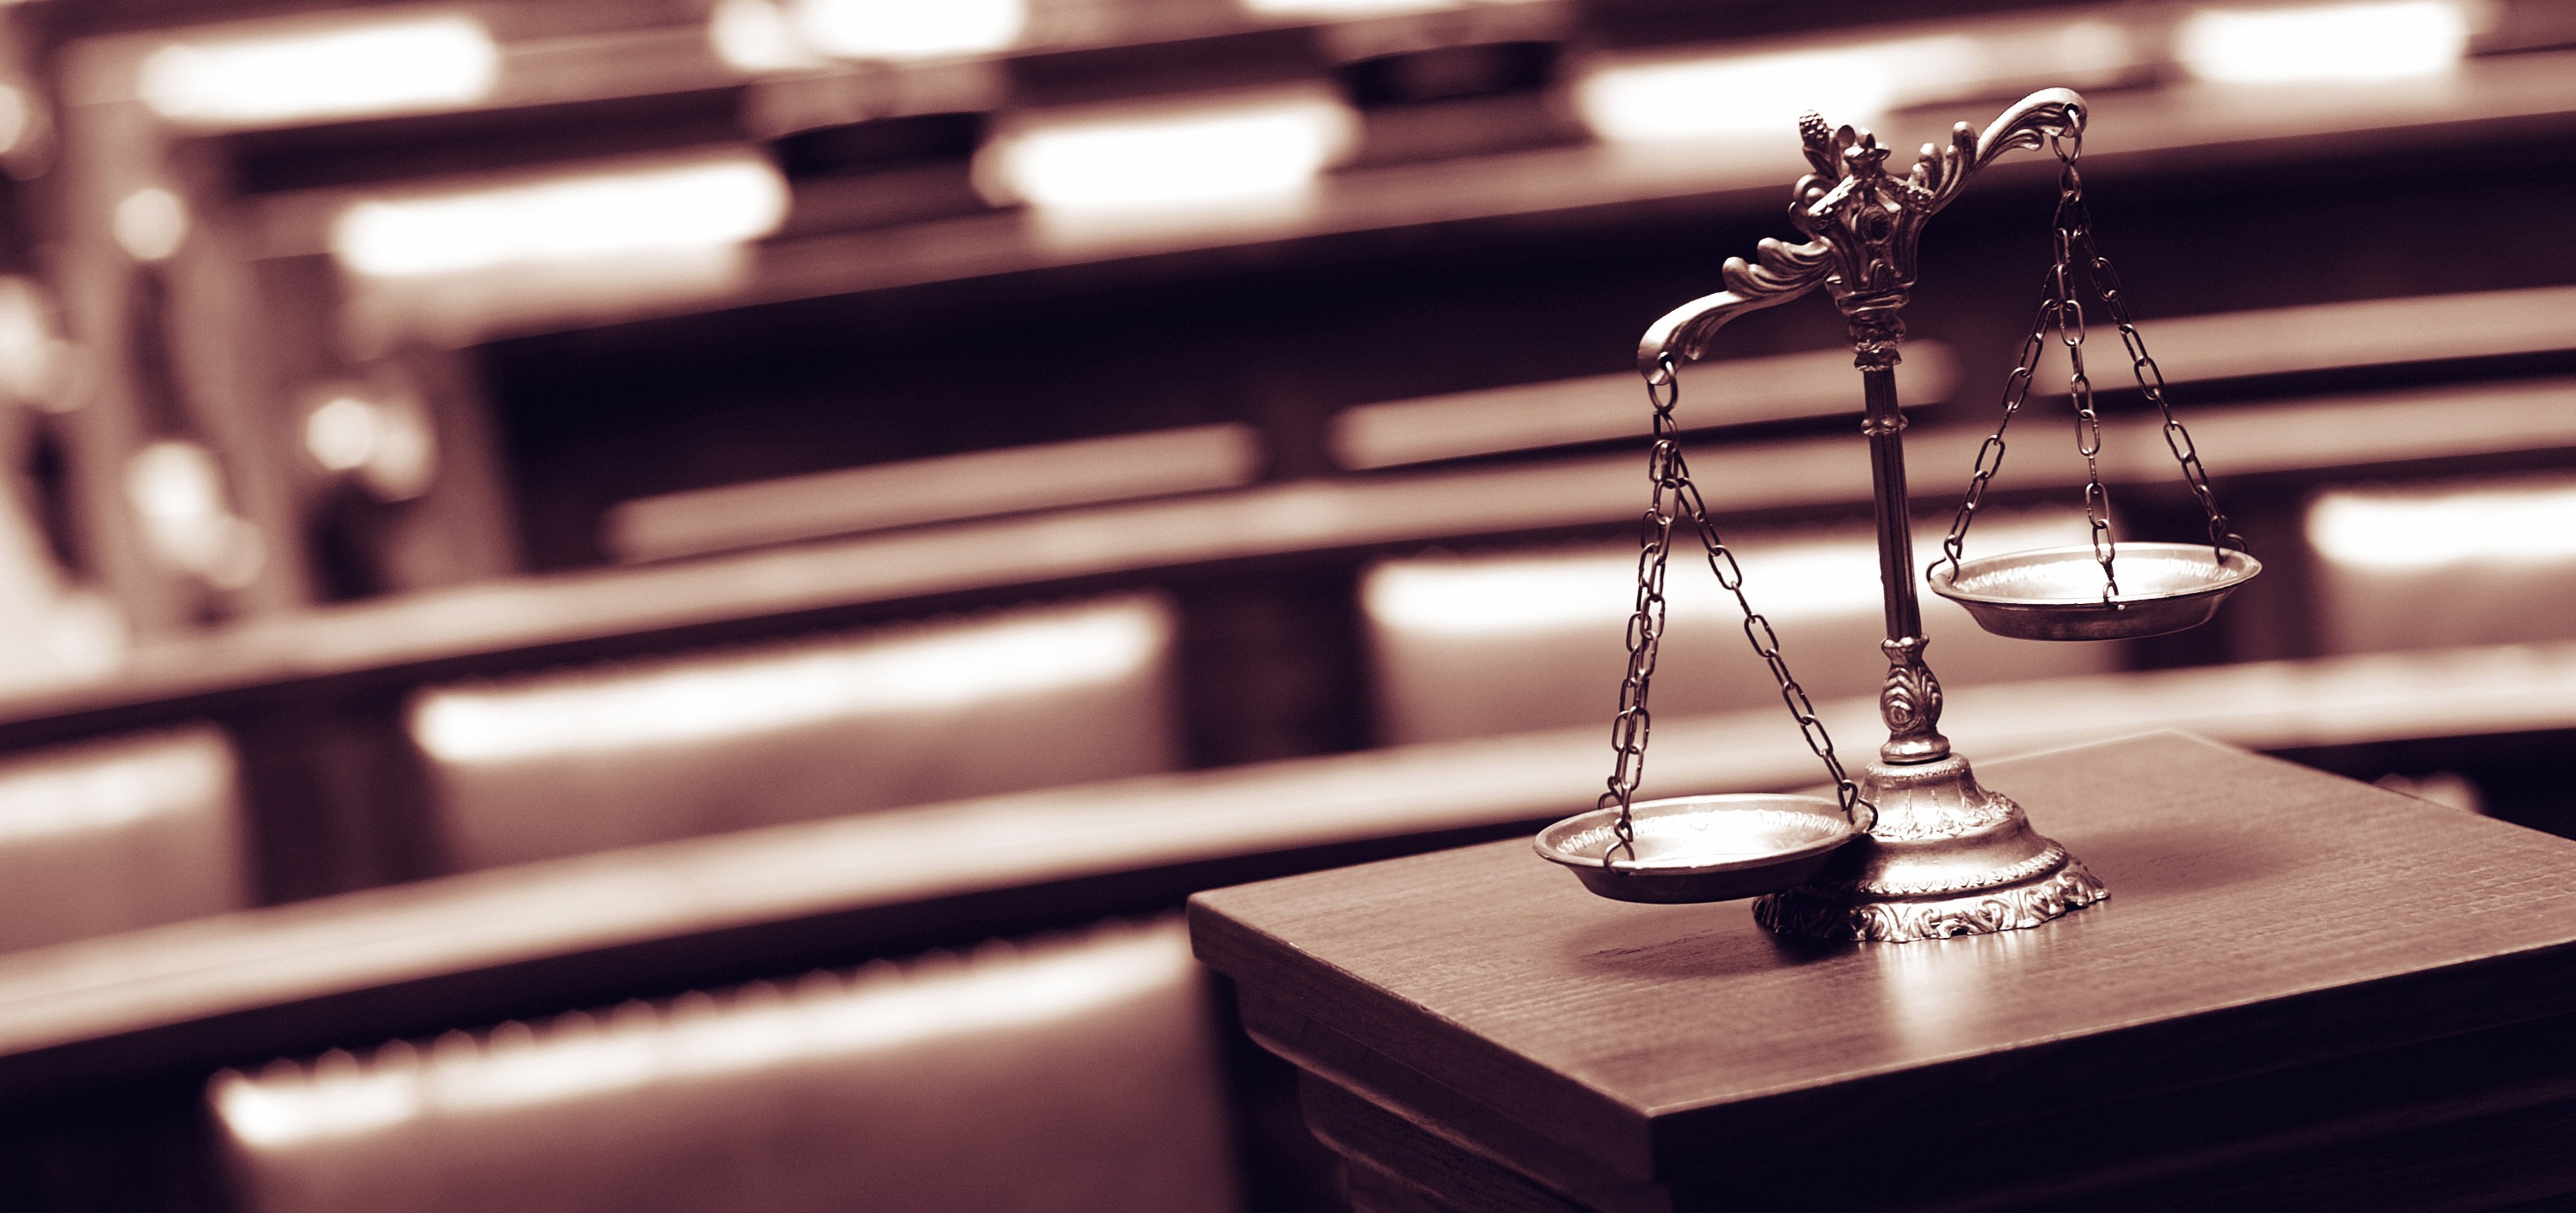 Judicial Administration and Judicial Process Roundtable